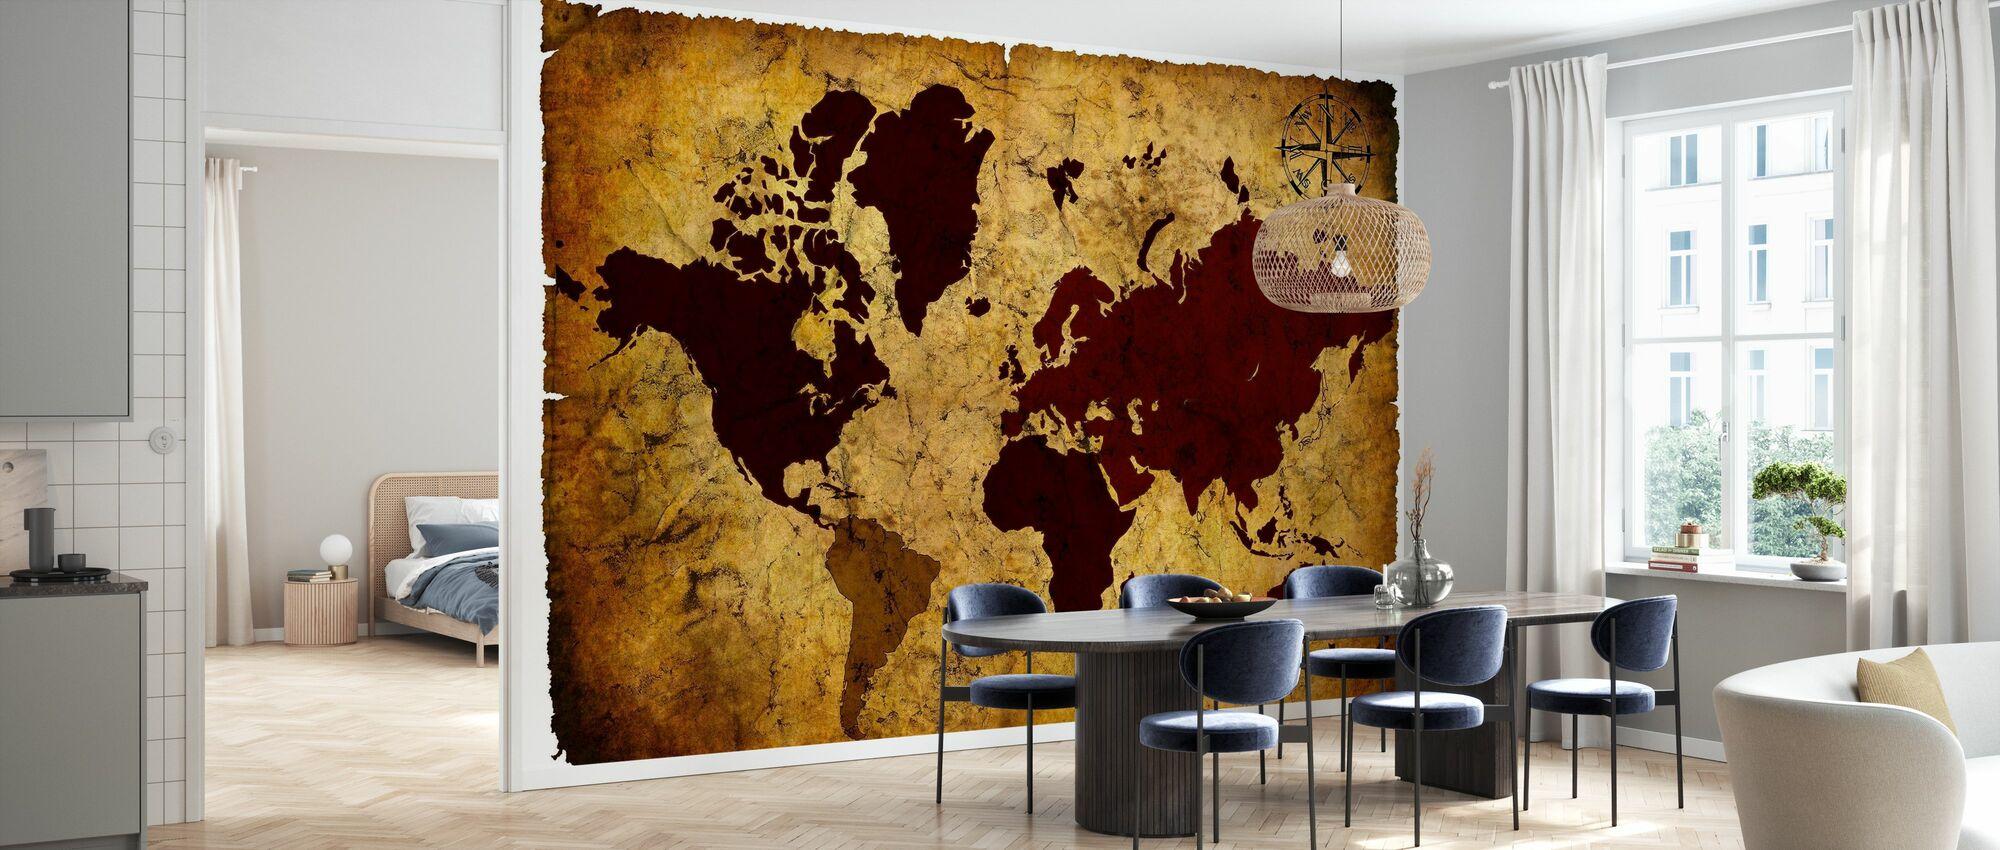 Old Manuscript of World Map - Wallpaper - Kitchen